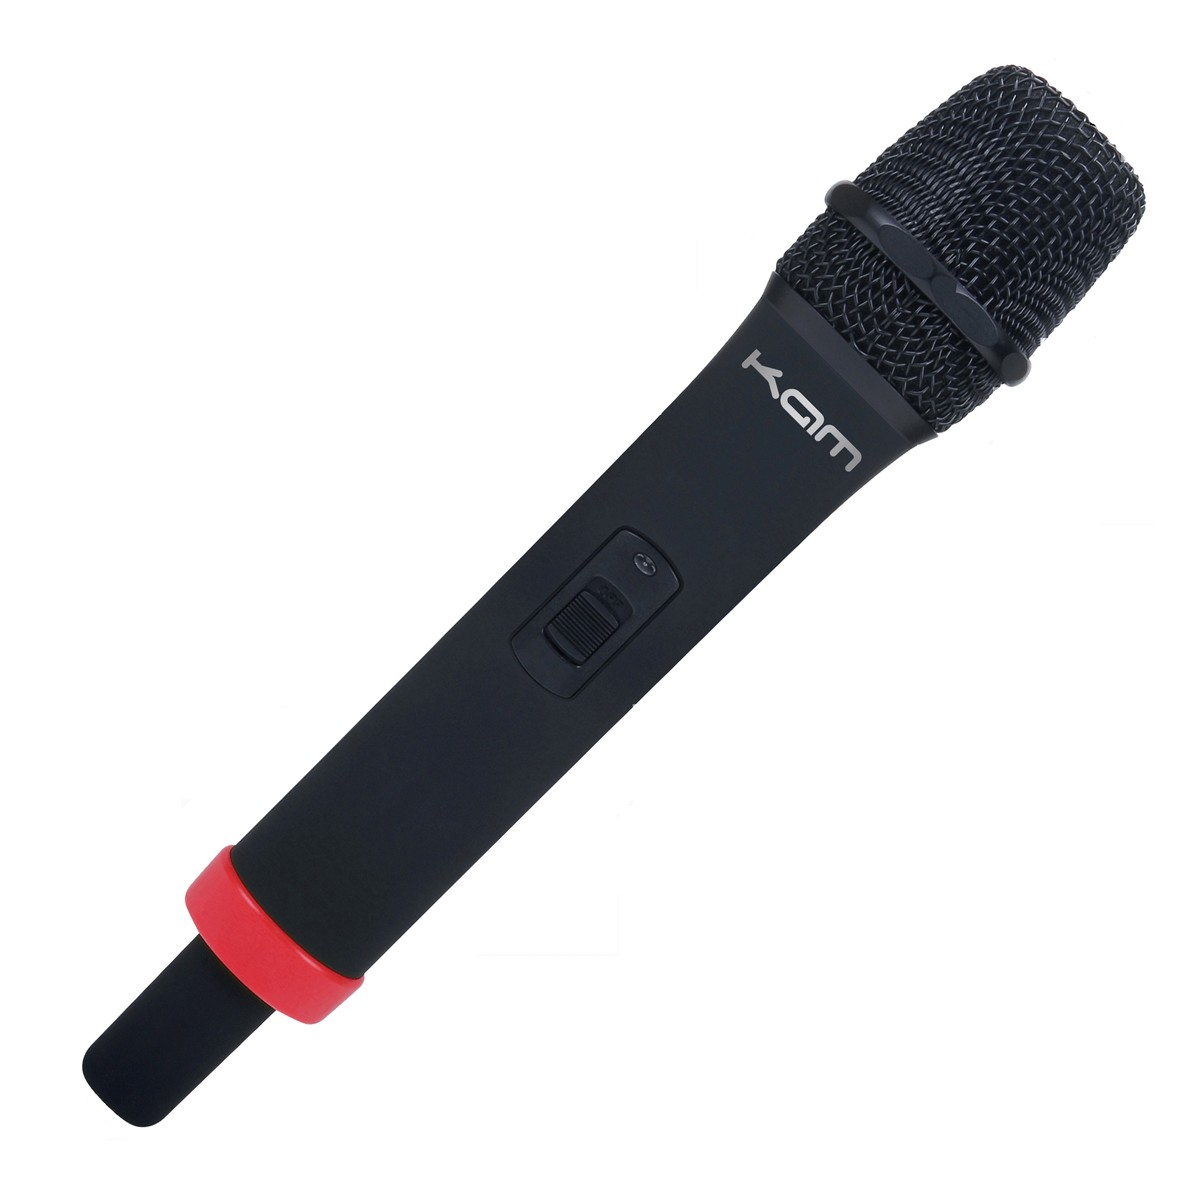 kam kwm quartet wireless microphone kit b stock at gear4music